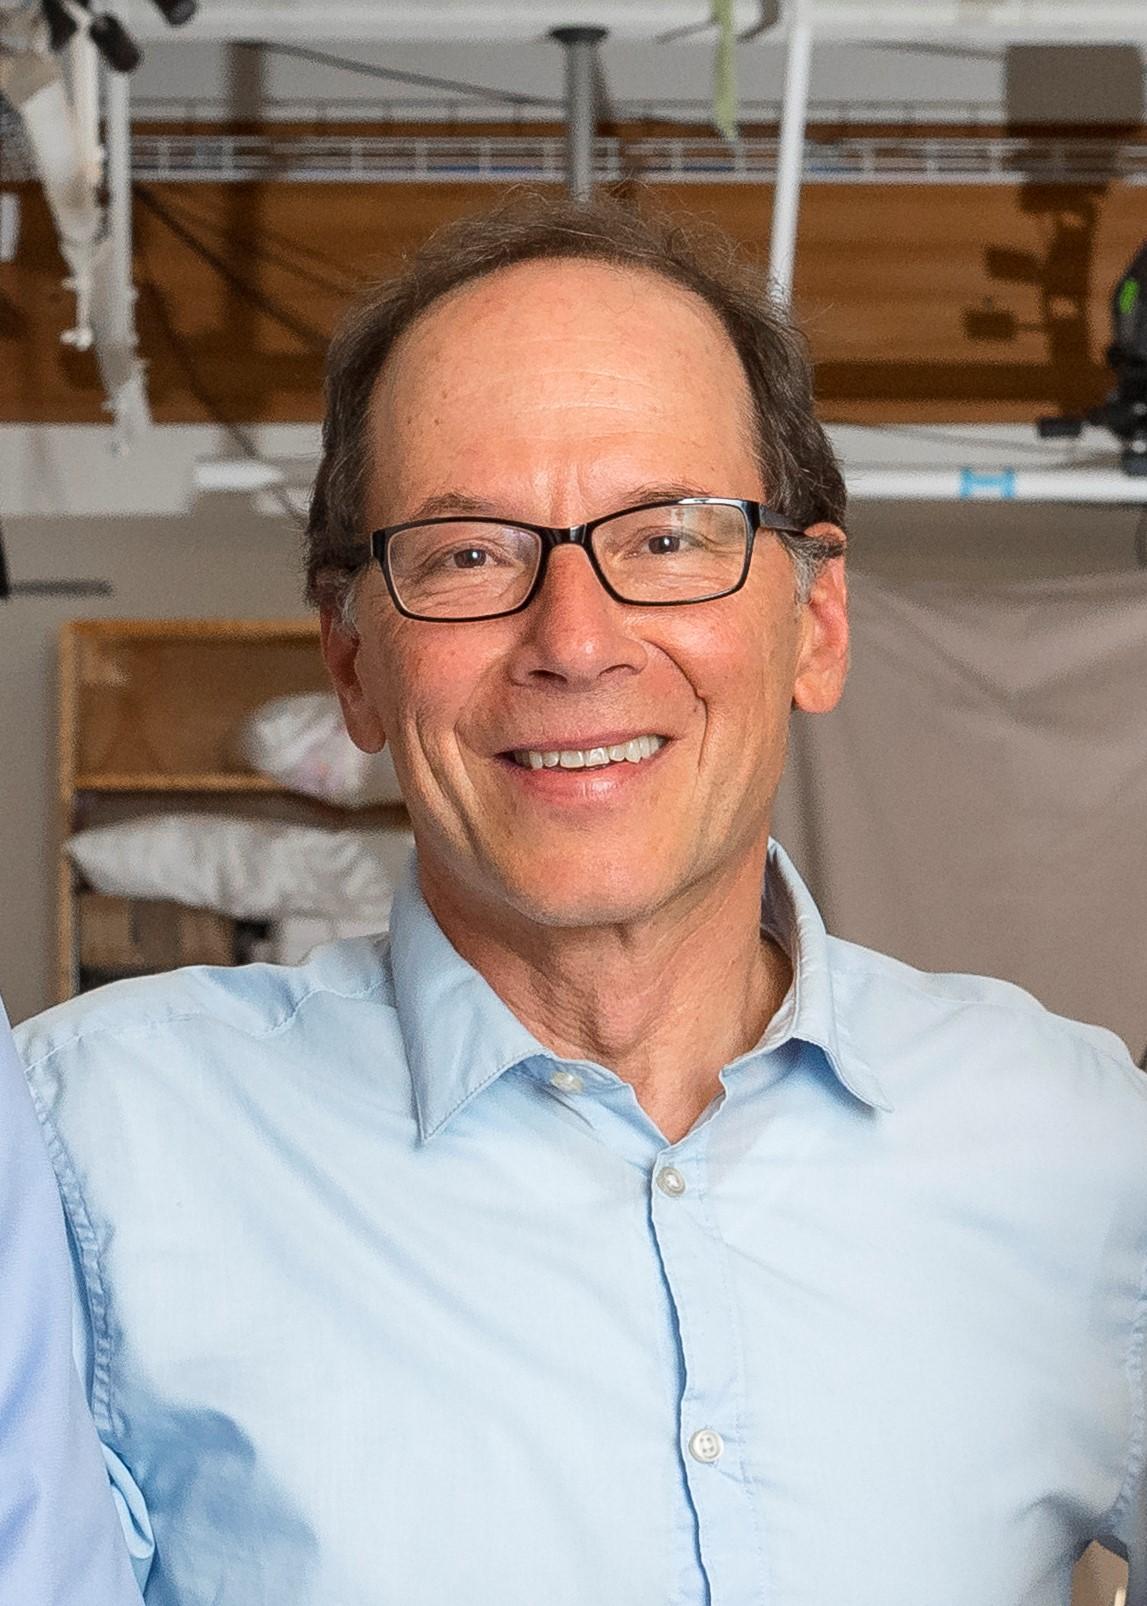 Dr. Steve Robinovitch